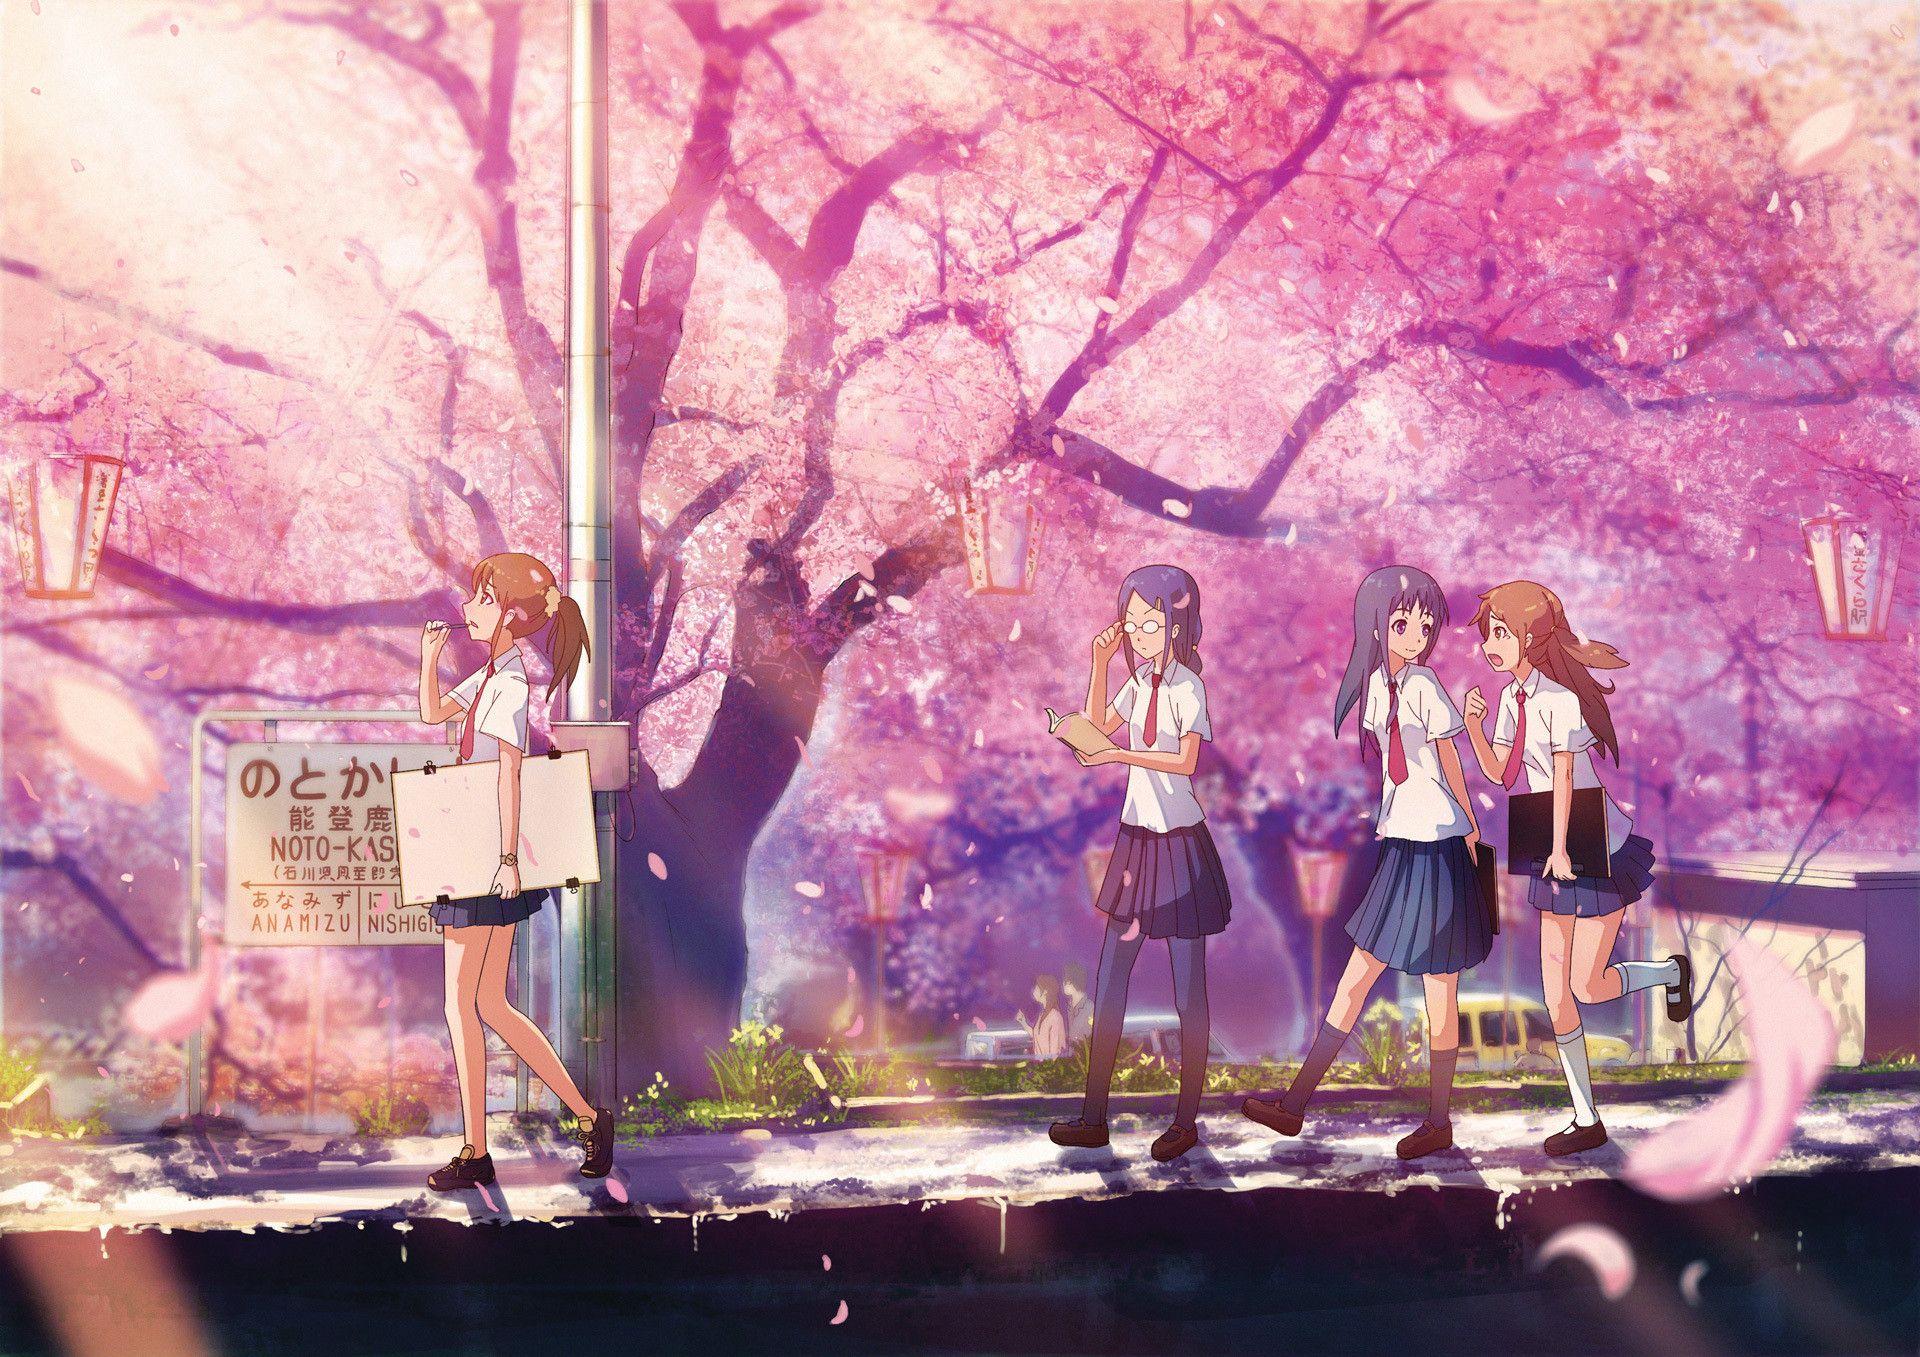 1920x1357 Anime Scenery wallpaper Anime Landscape